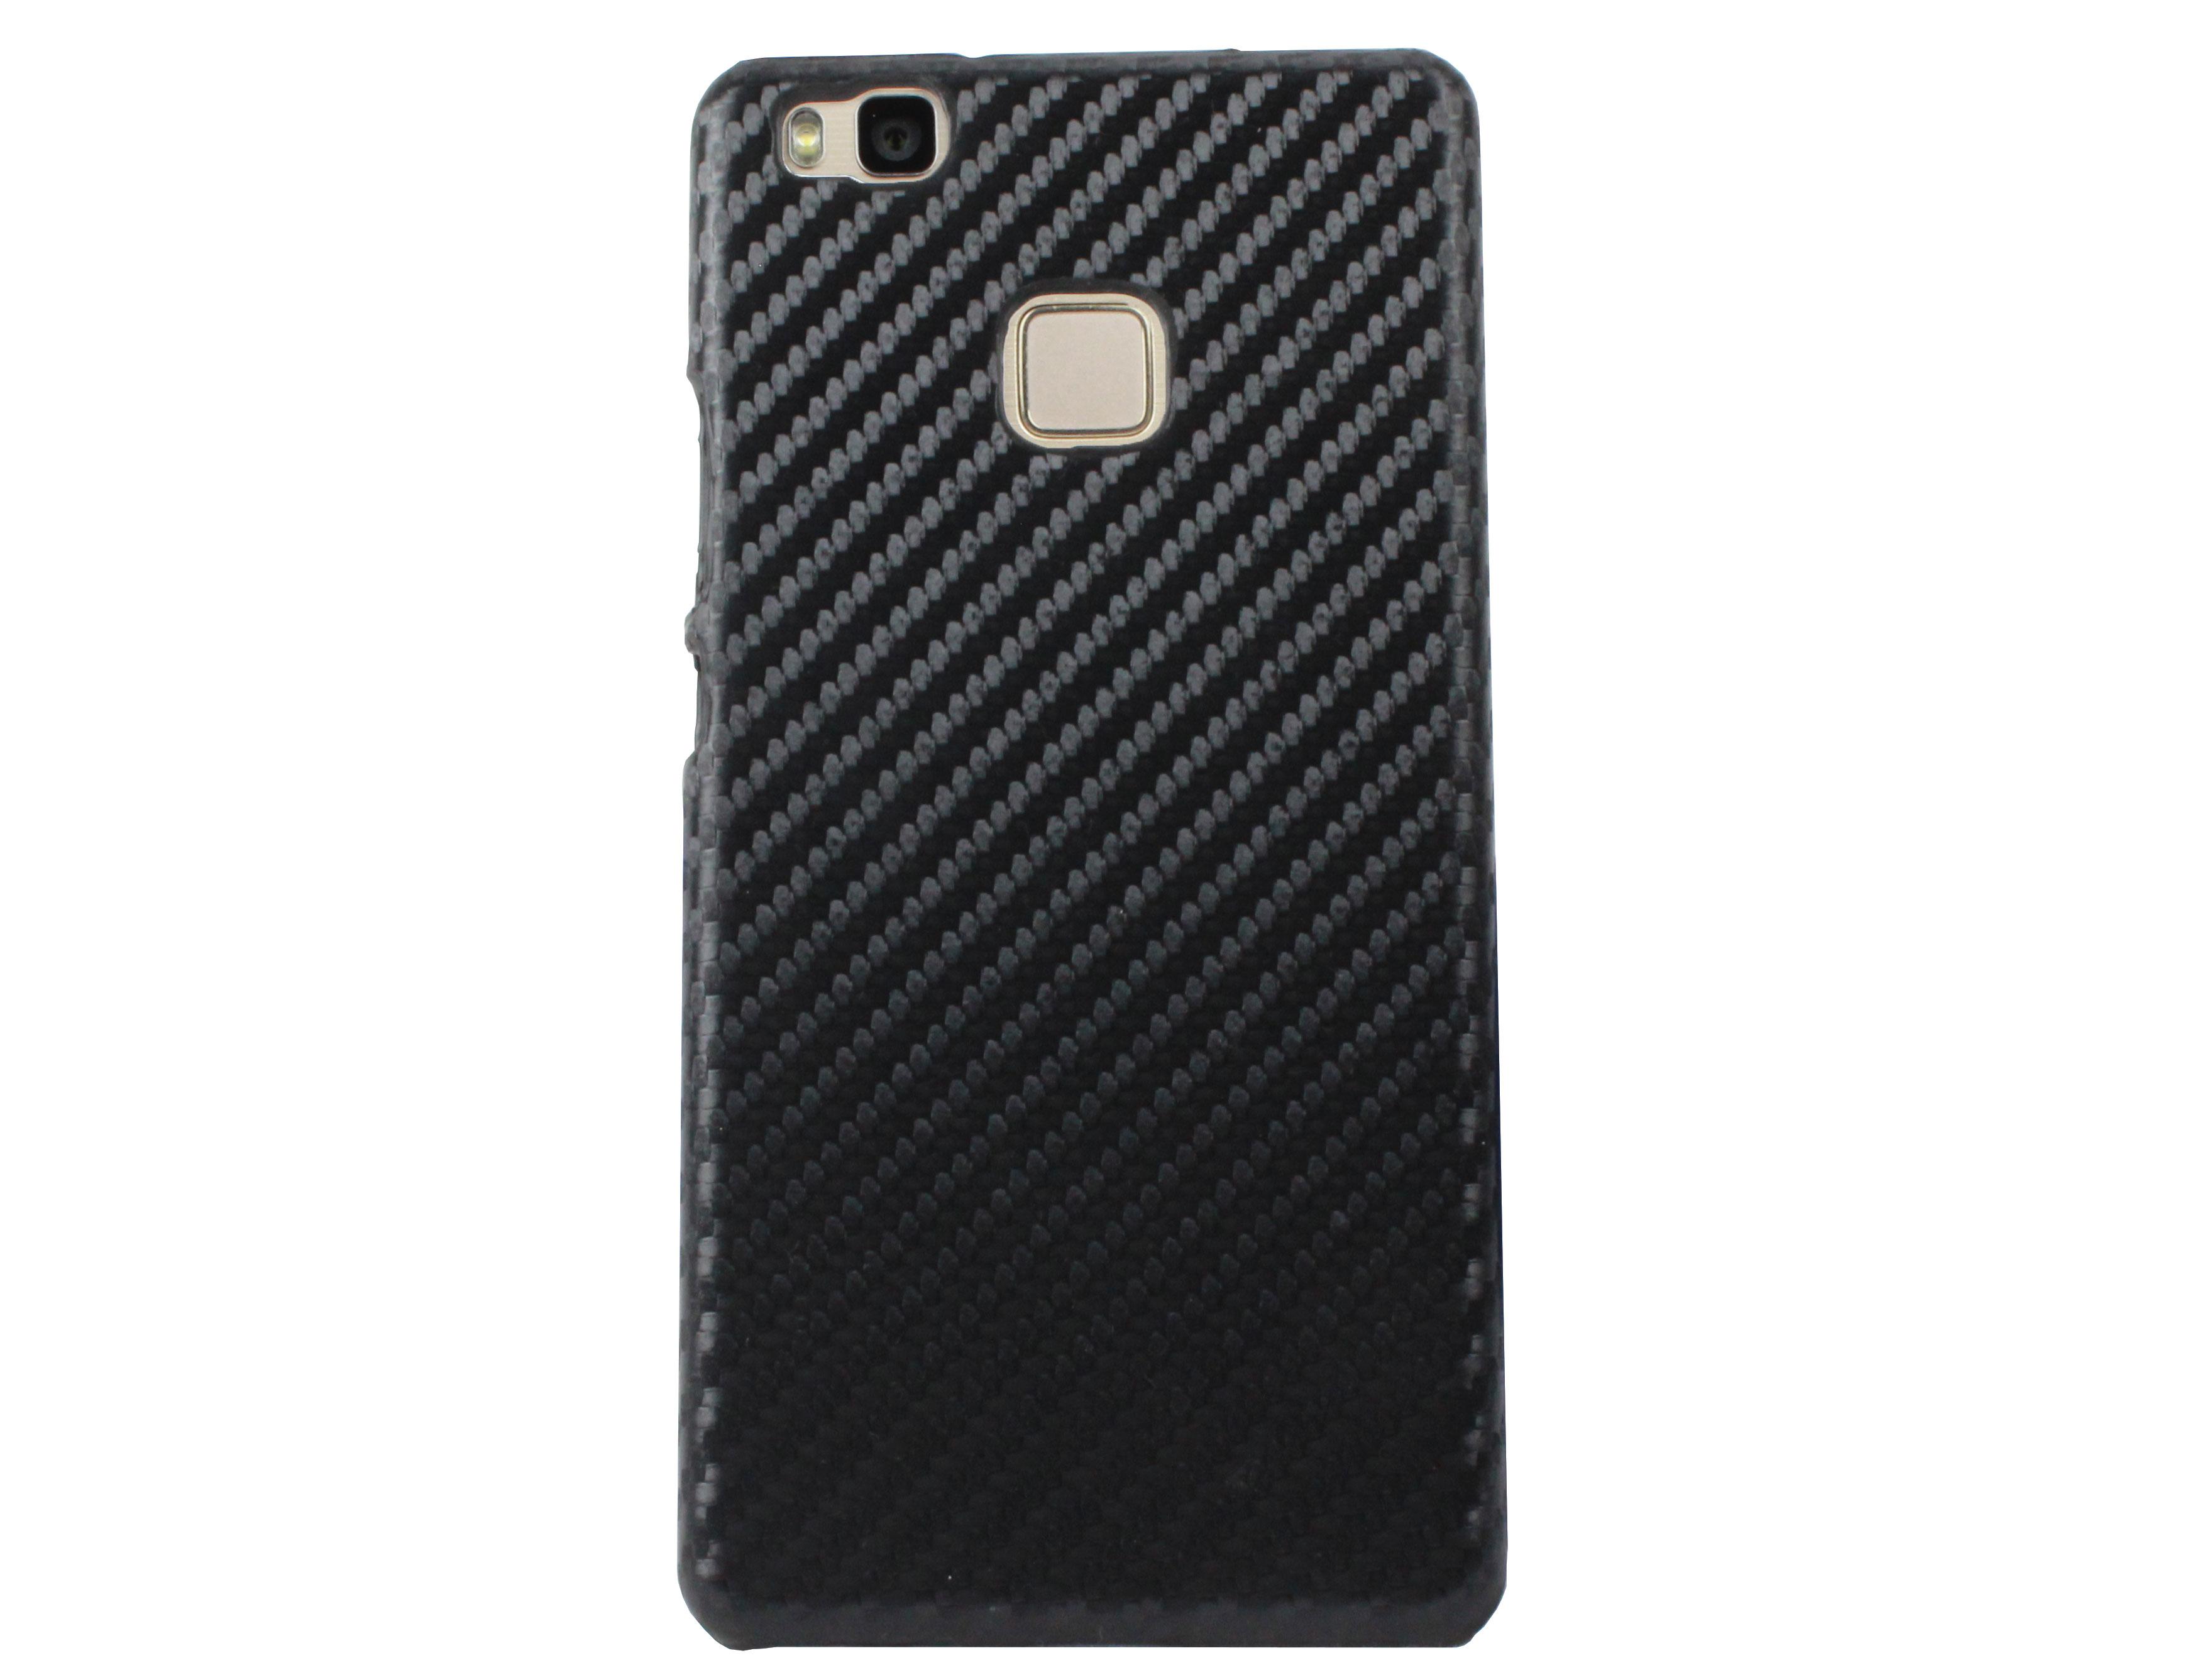 Kasseri Huawei P9 Lite Cover i carbon look